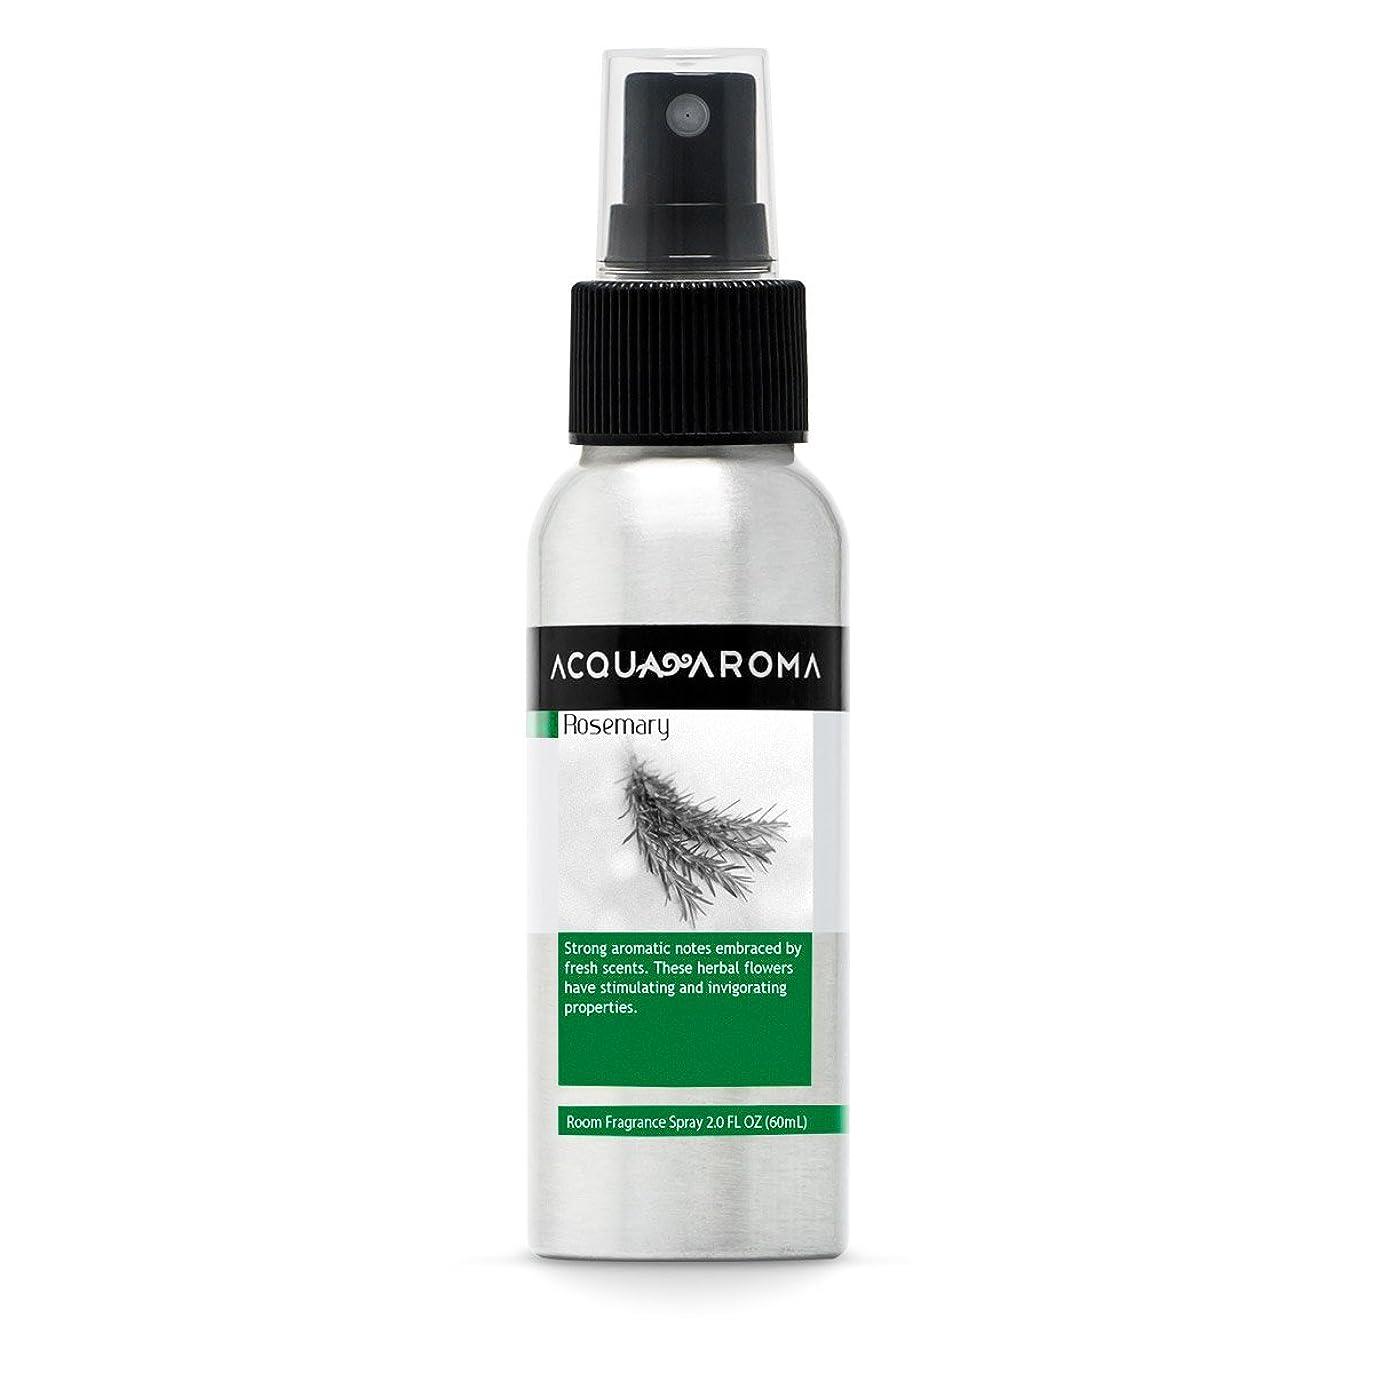 AcquaアロマローズマリーRoom Fragranceスプレー2.0?FL OZ ( 60ml )